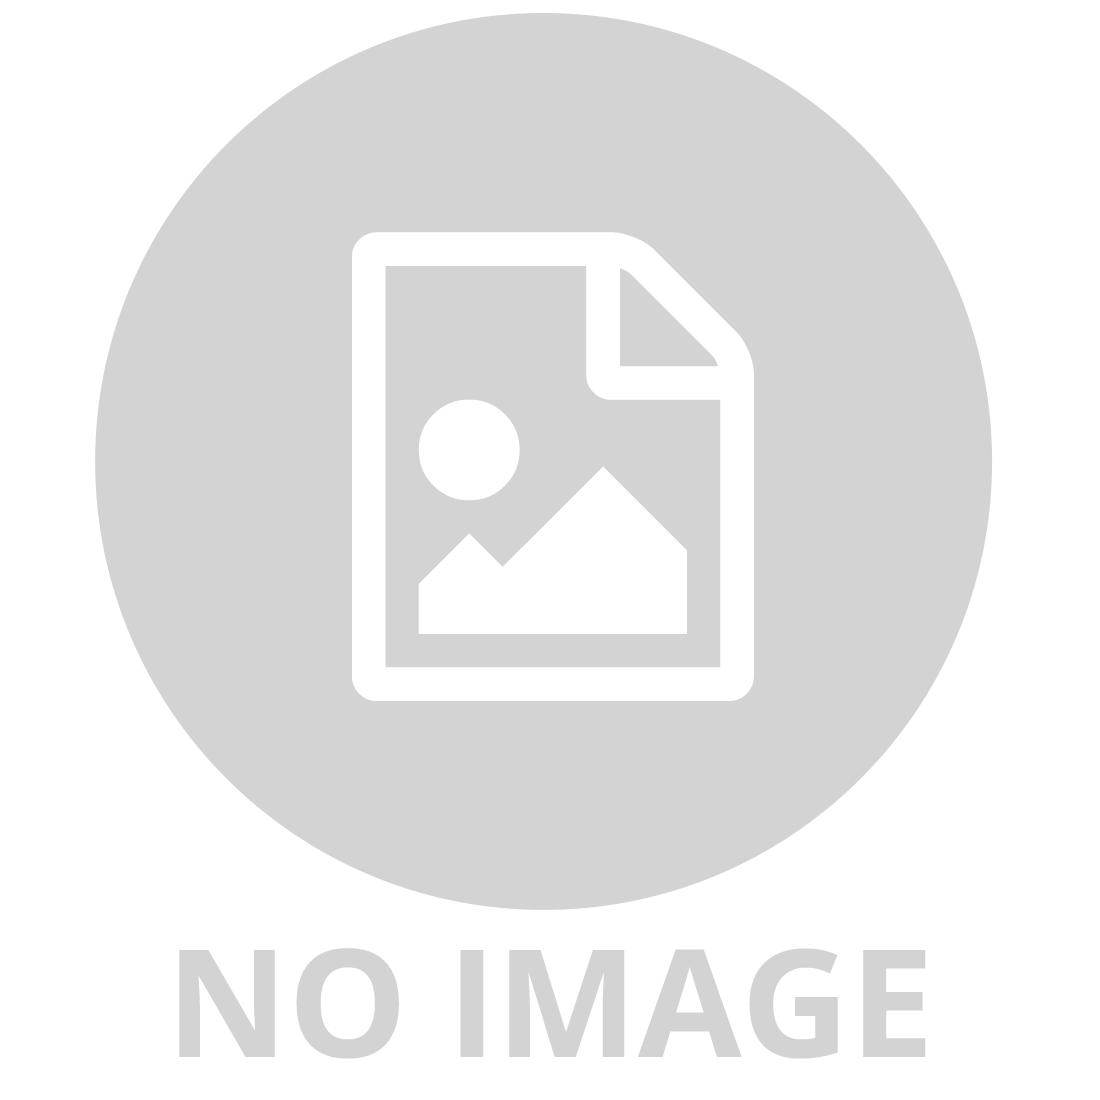 LEGO MARVEL 76114 SPIDER-MAN'S SPIDER CRAWLER